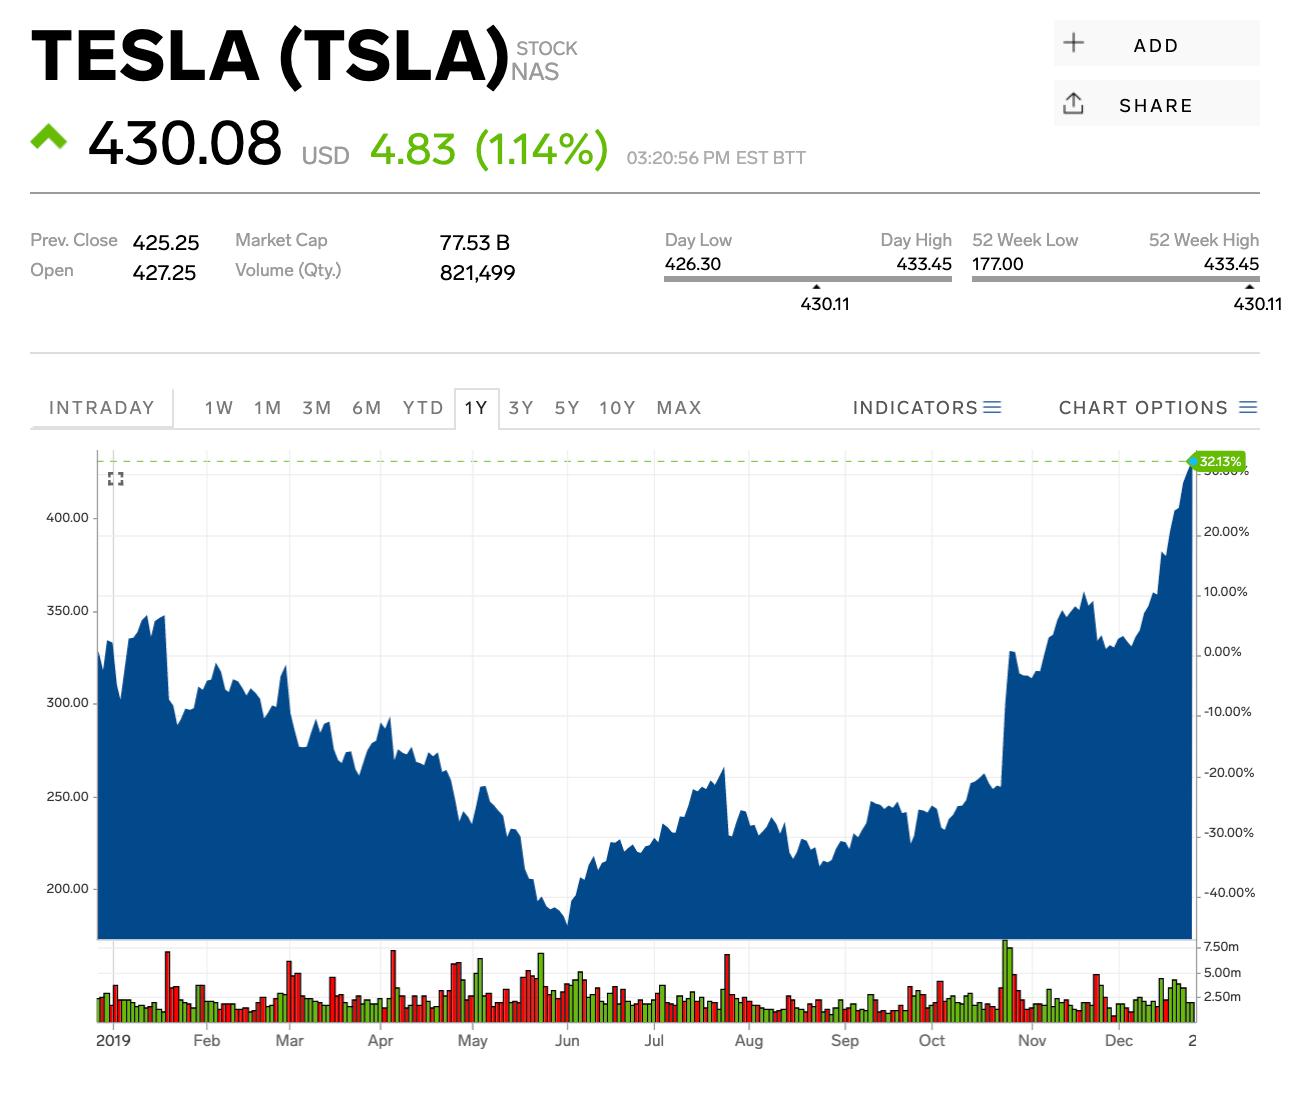 Tesla Stock Price Gains As Wedbush Analyst Boosts Price